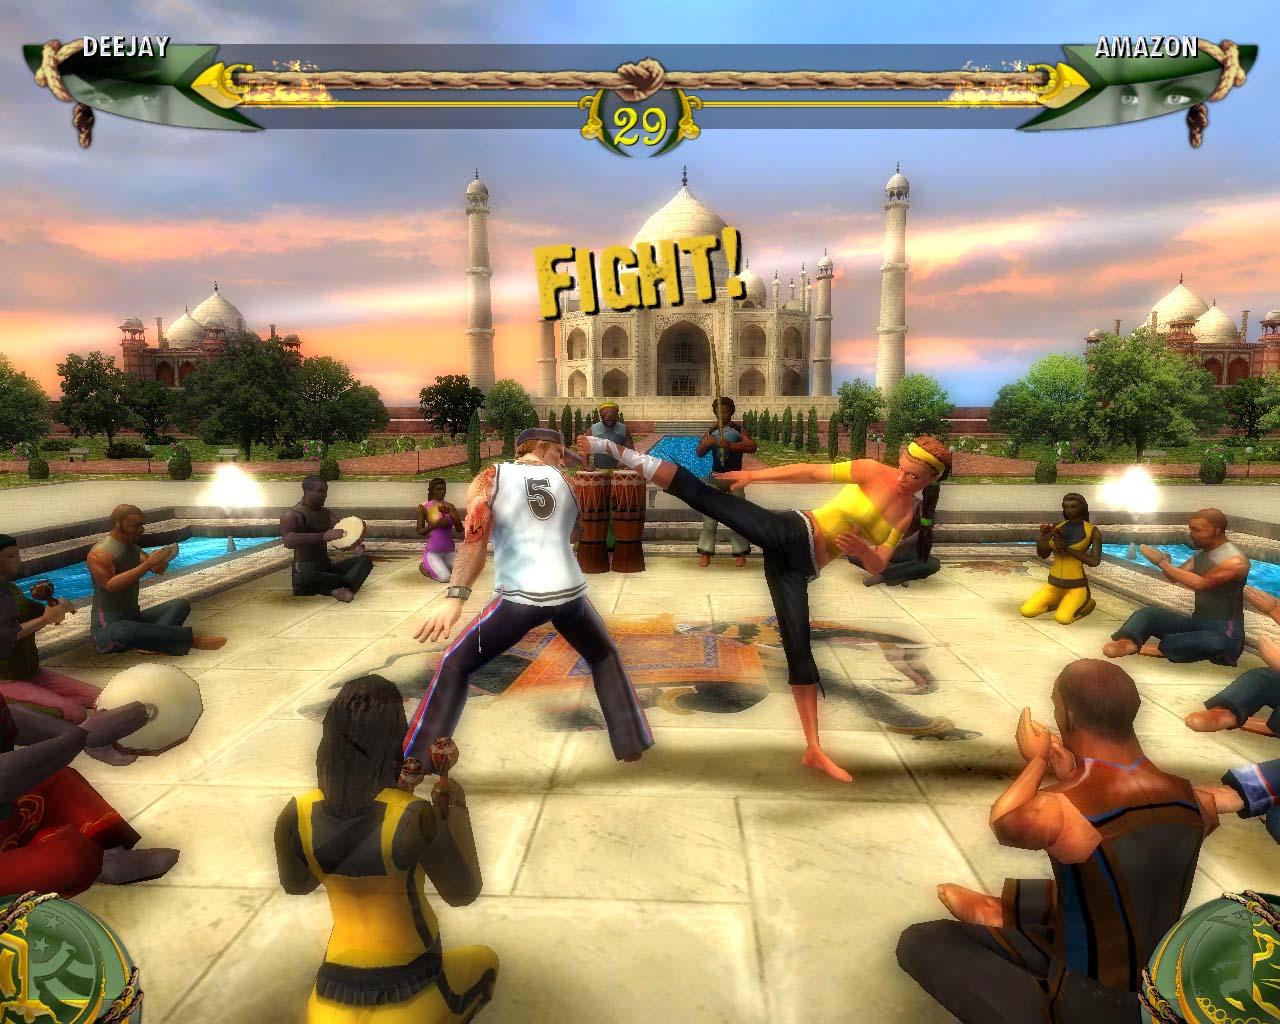 Martial-Arts-Capoeira-Gameplay-Screenshot-2